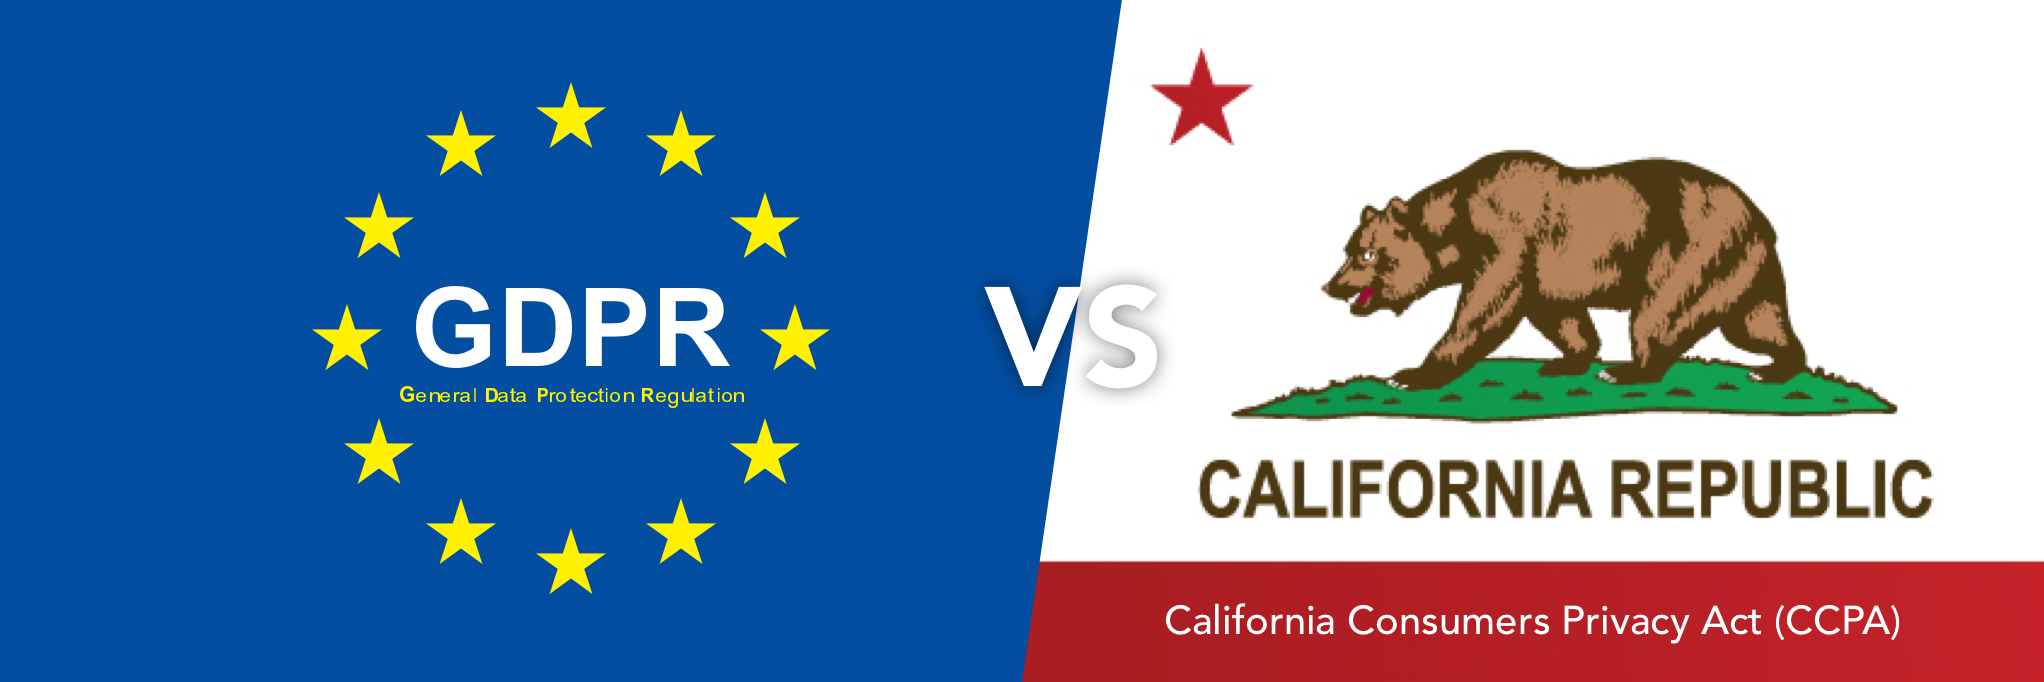 GDPR vs. the California Consumers Privacy Act (CCPA)